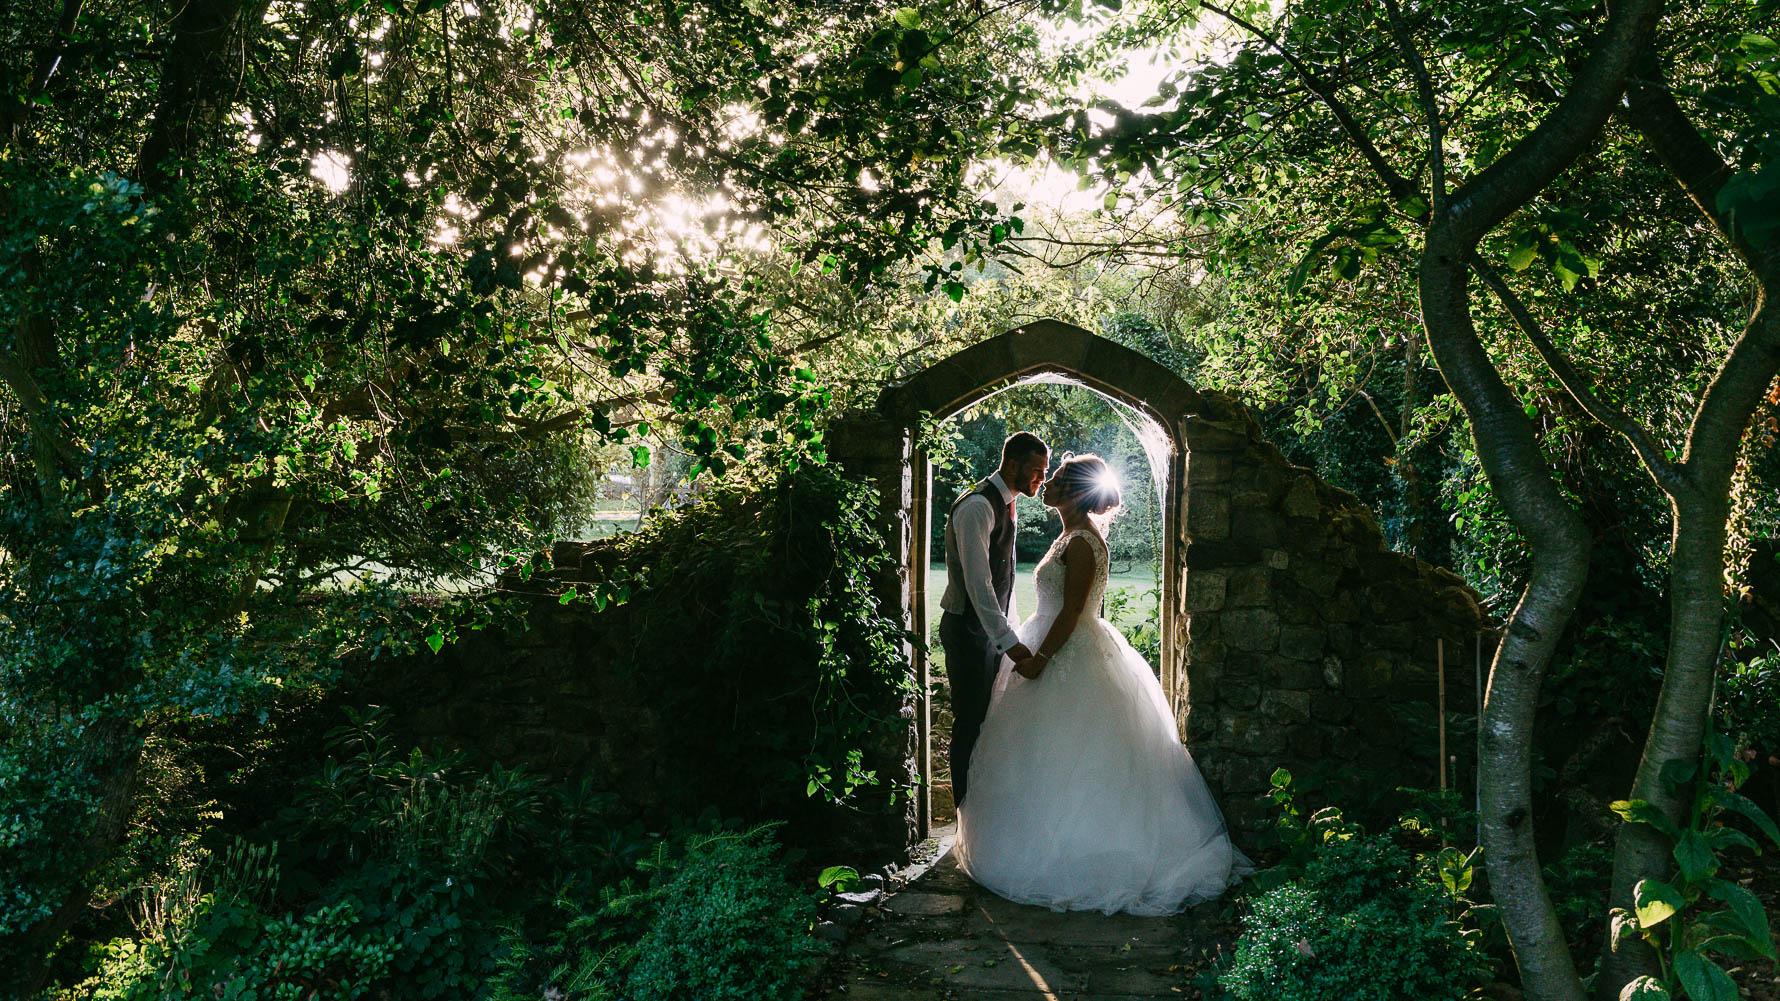 Wedding photography at Solton Manor-5.jpg